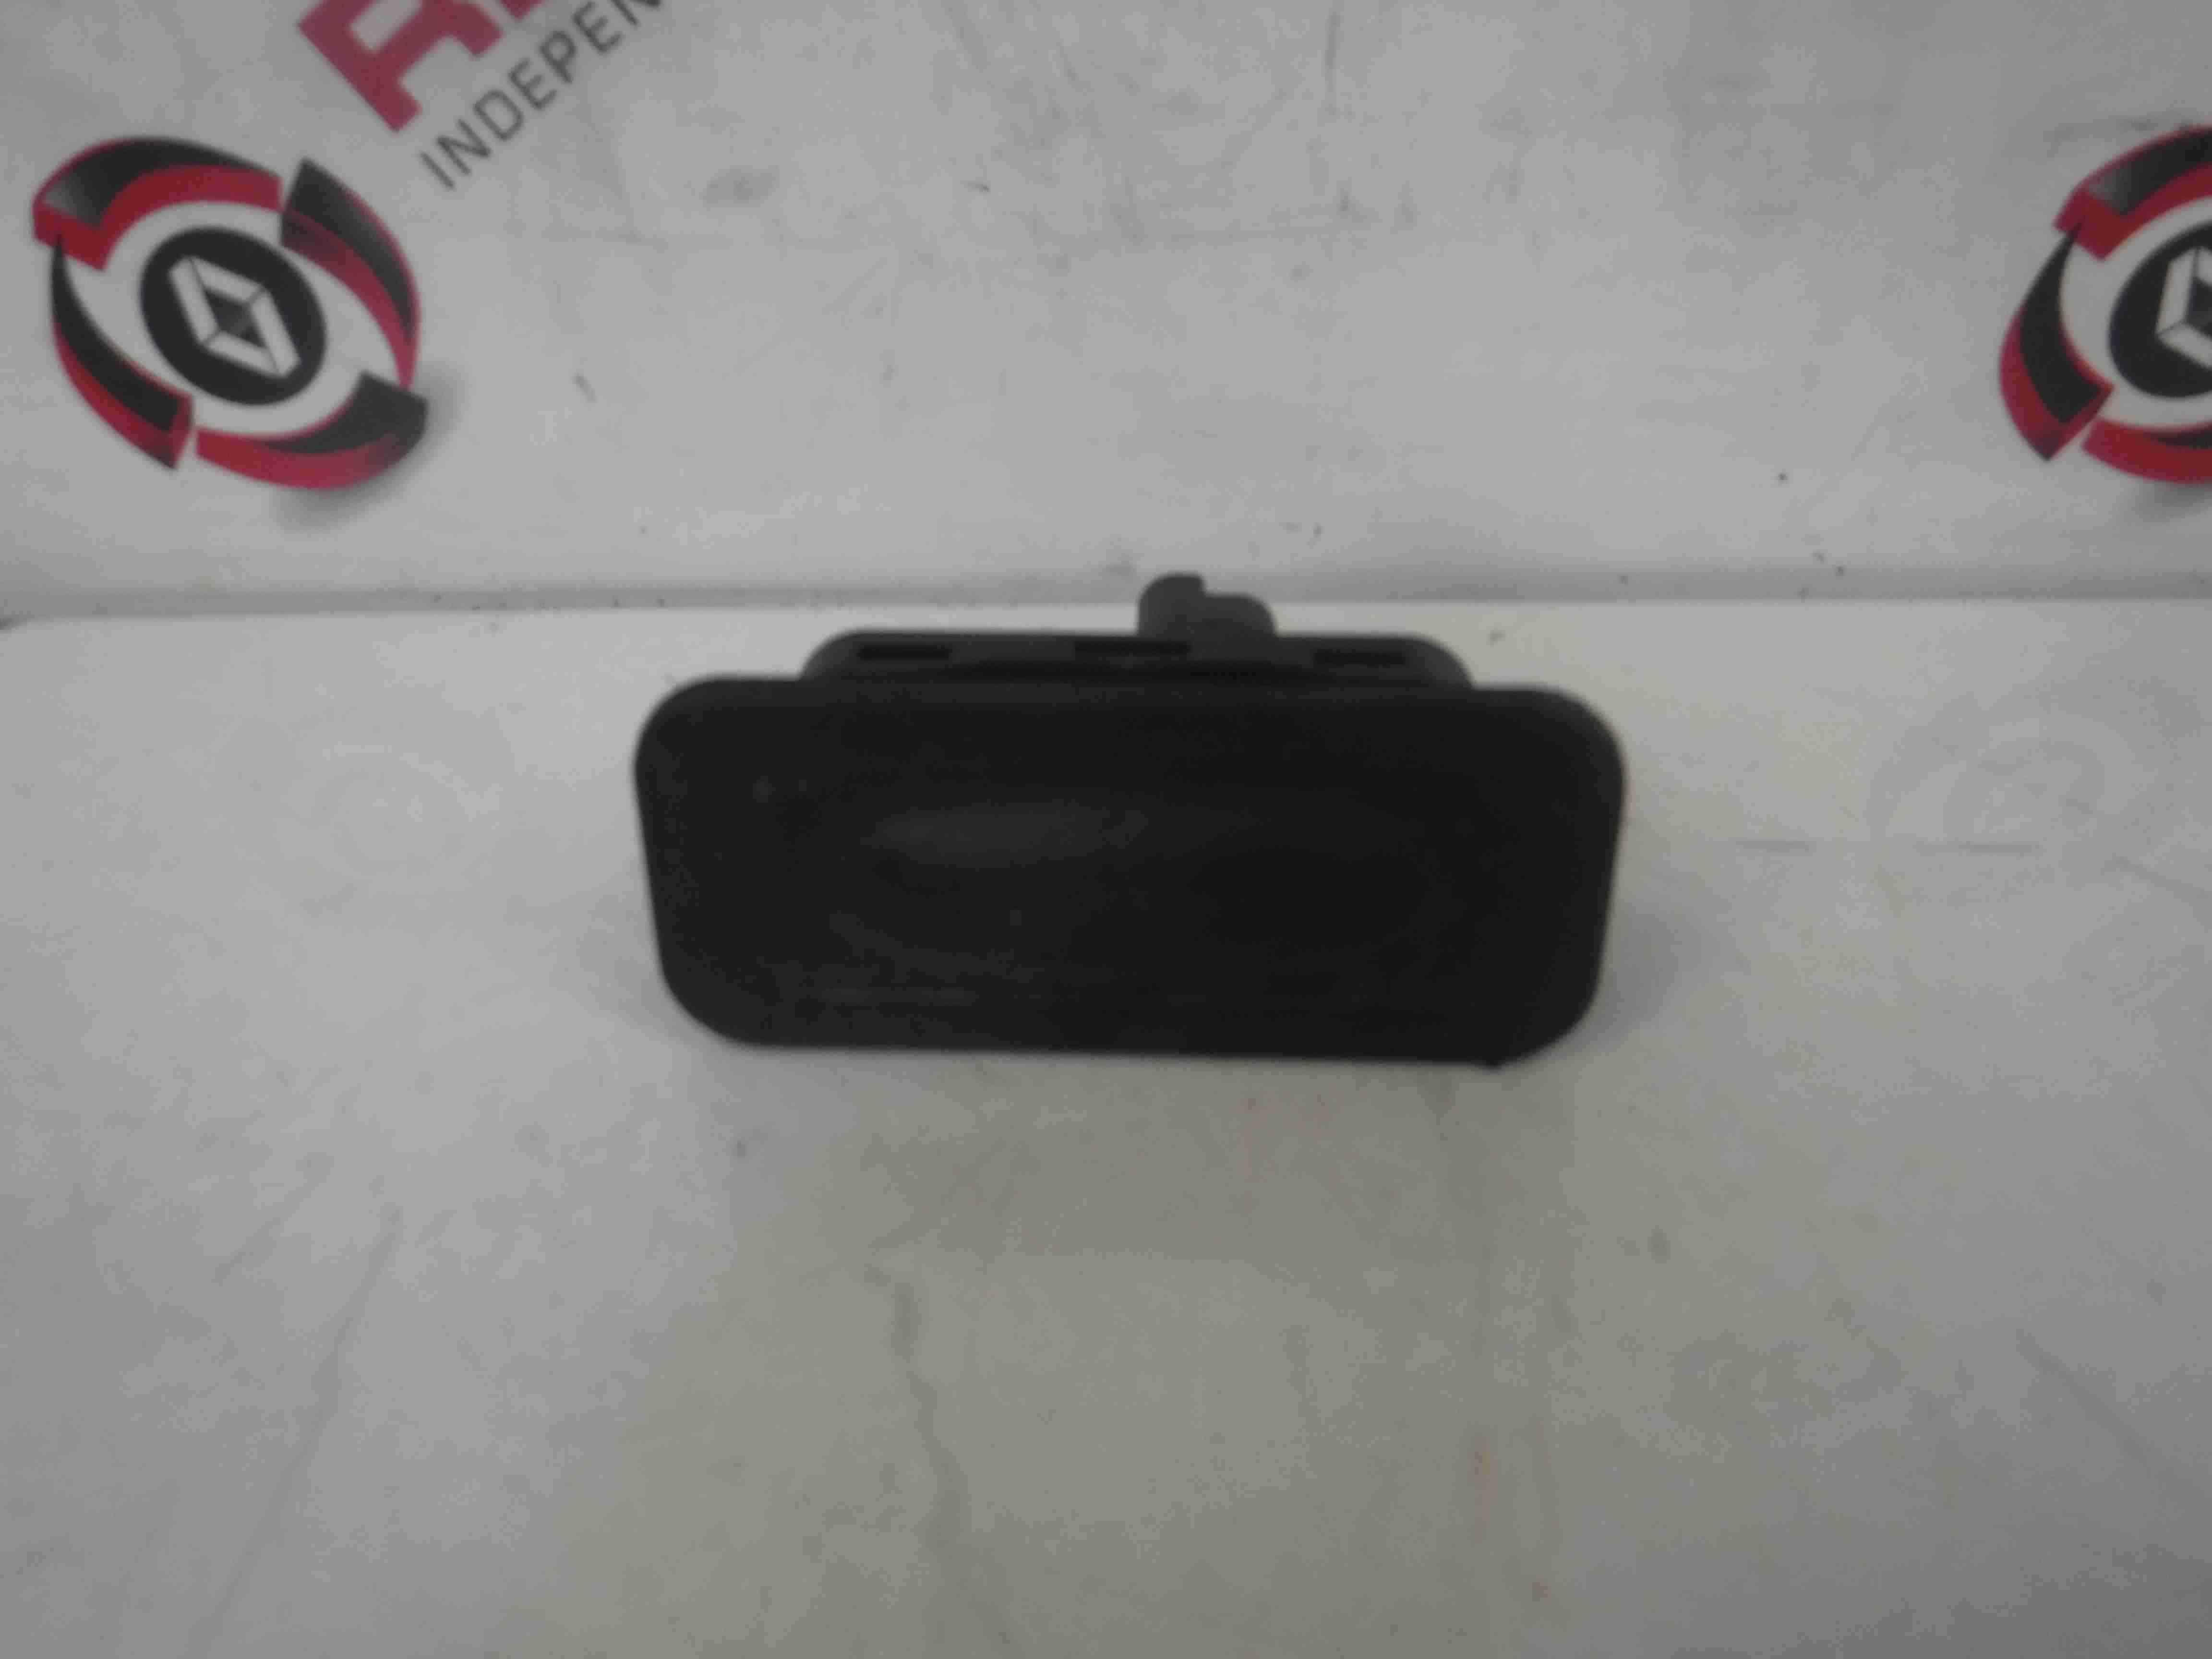 Renault Twingo 2007-2011 Boot Lock Push Button 8200076256